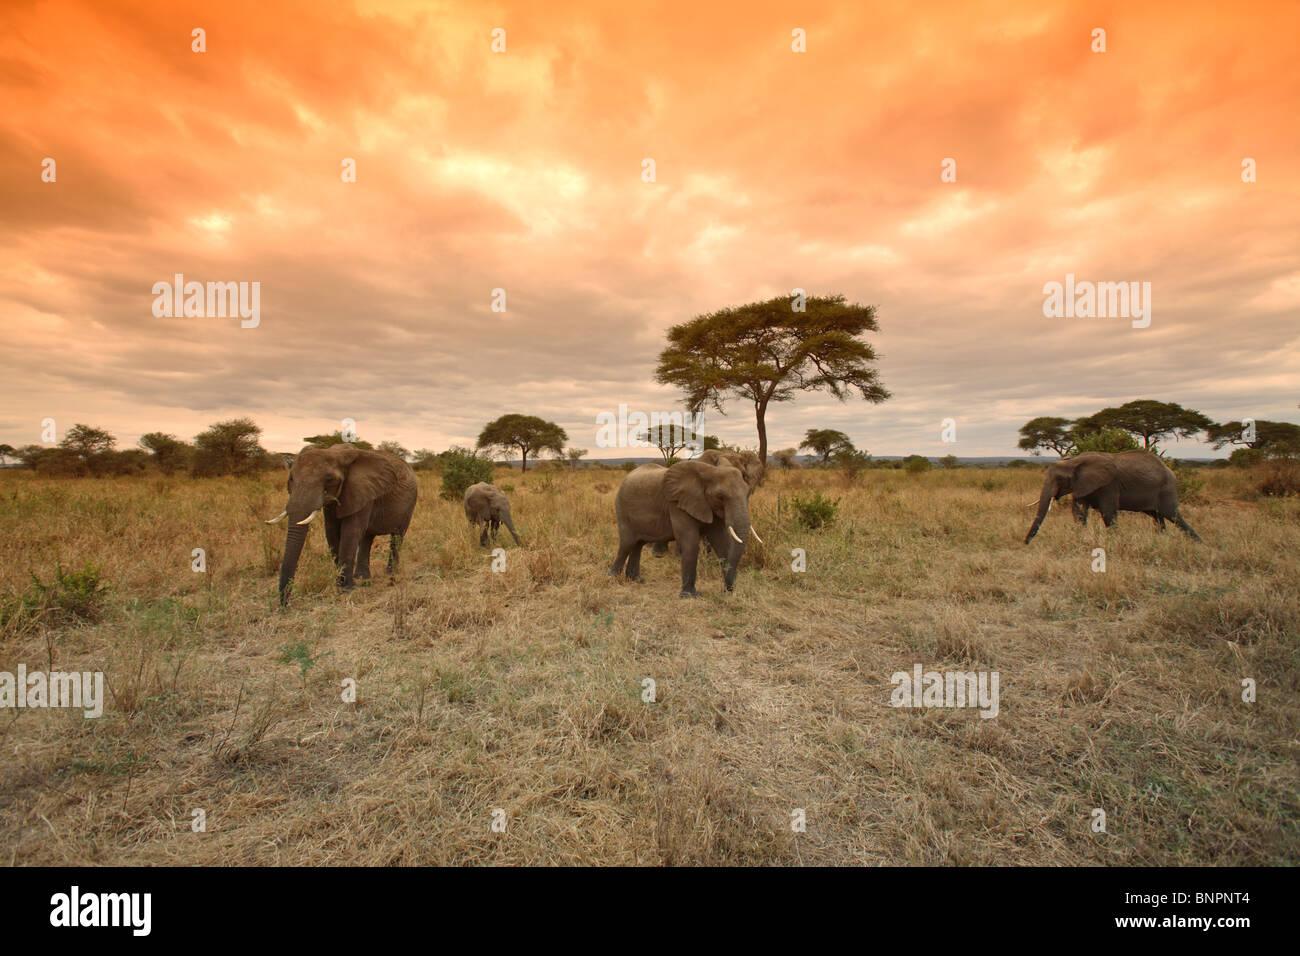 Herd of African Elephants (Loxodonta africana) on the move, Tarangire National Park, Tanzania - Stock Image